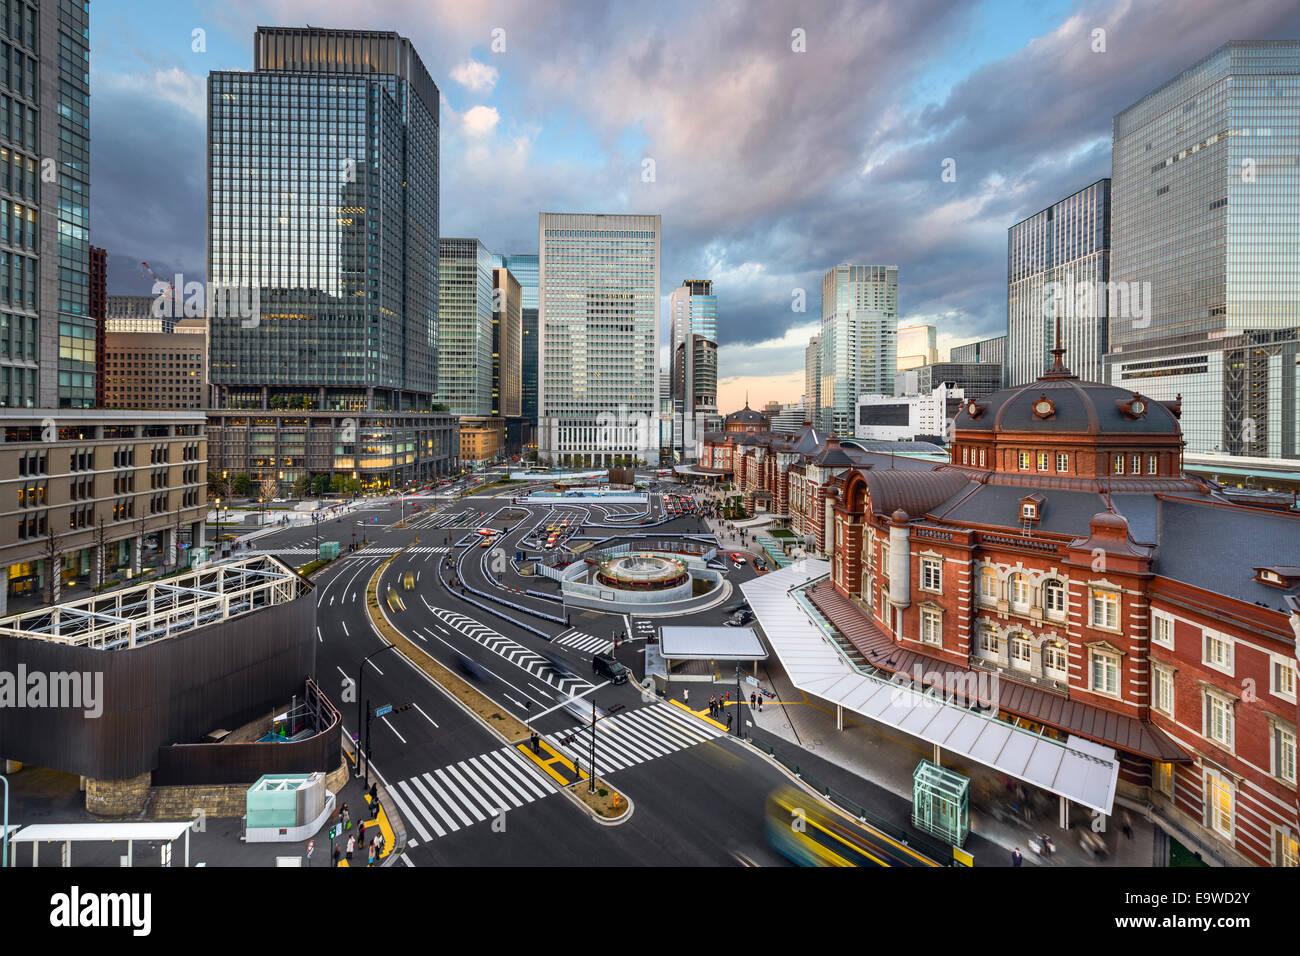 Tokyo, Japan cityscape at Tokyo Station. - Stock Image